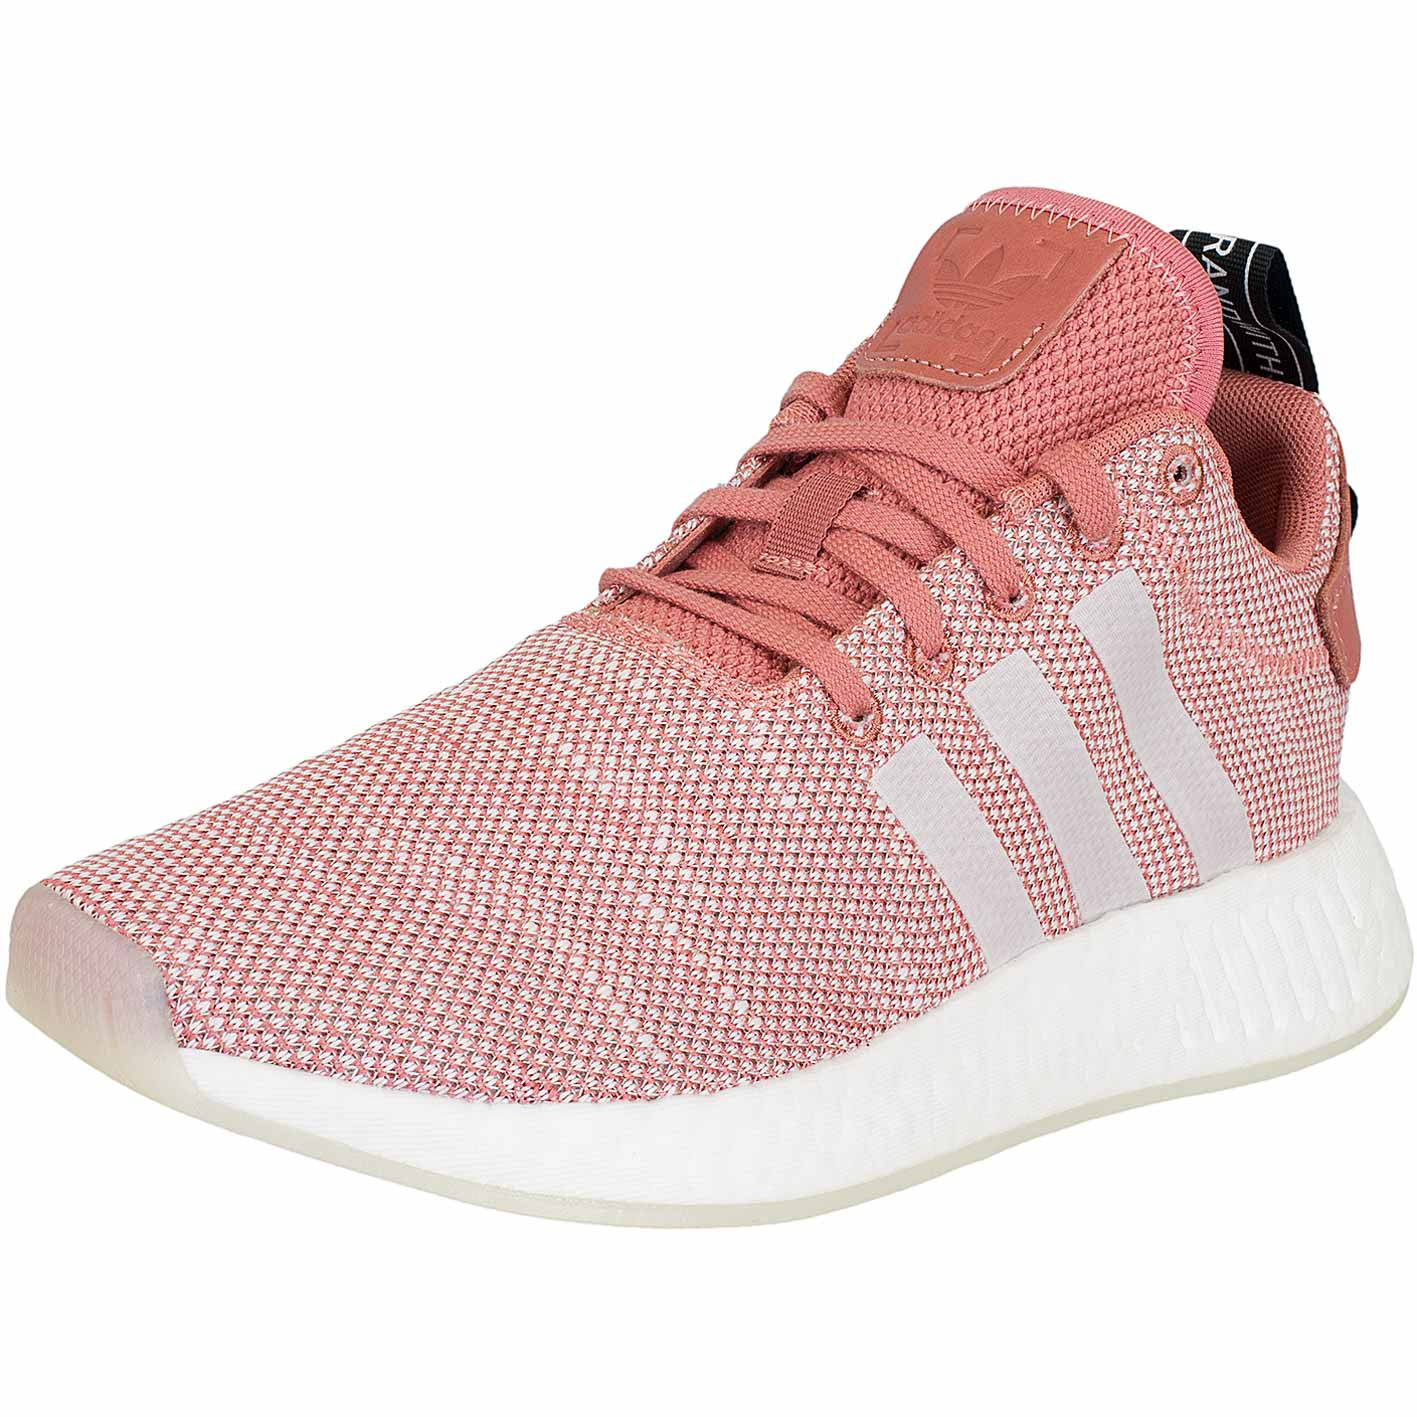 Adidas Originals Damen Sneaker NMD R2 ash pink